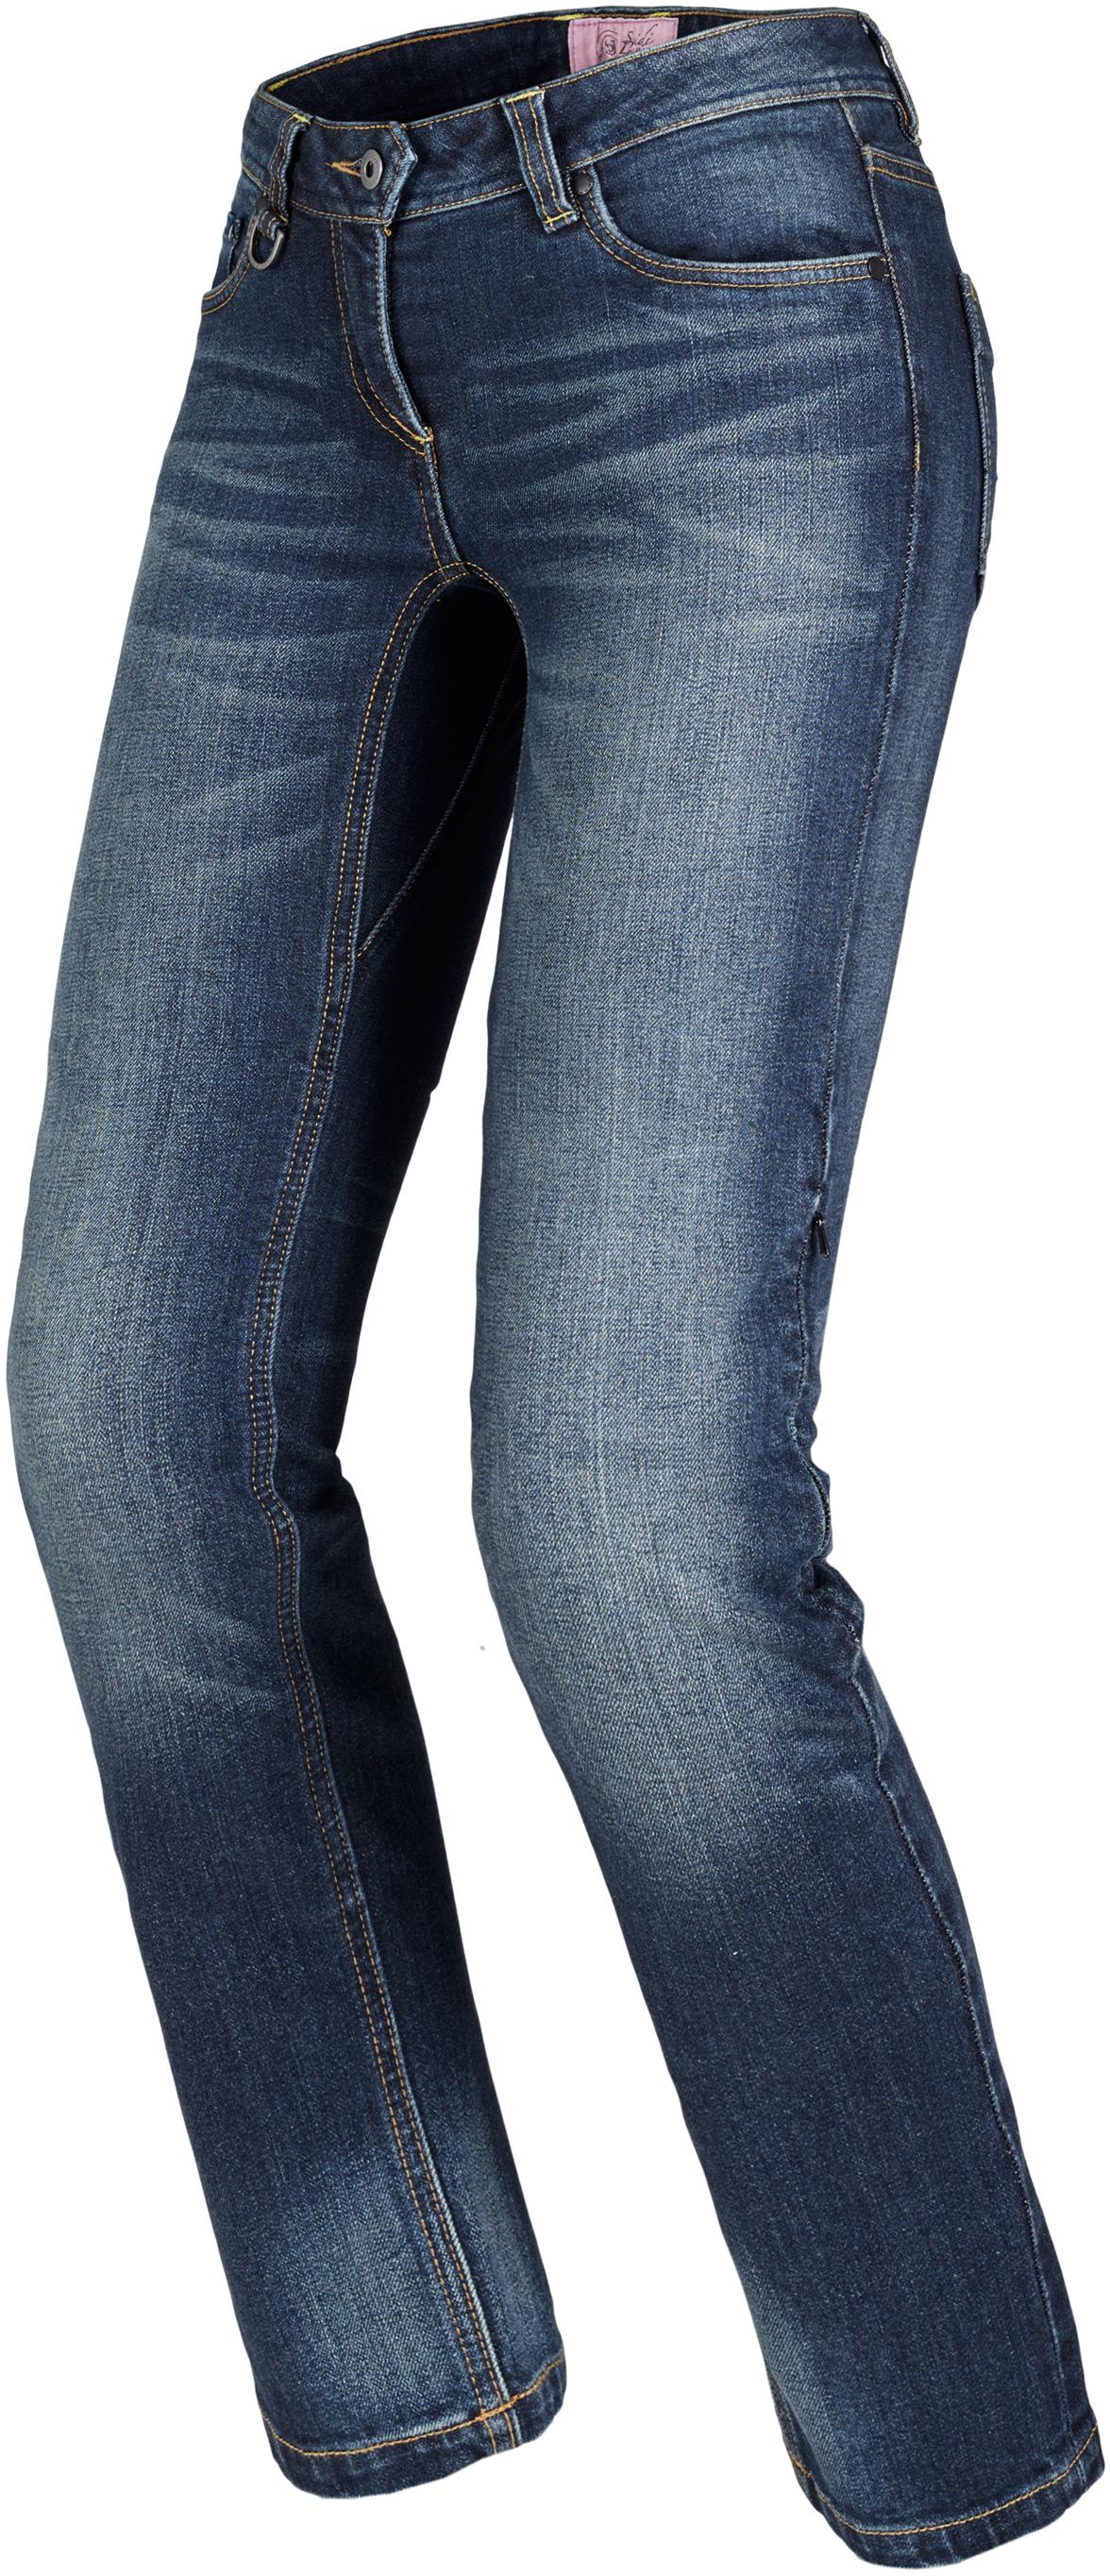 Spidi J-Tracker Pantalón Mujer Azul Oscuro 33